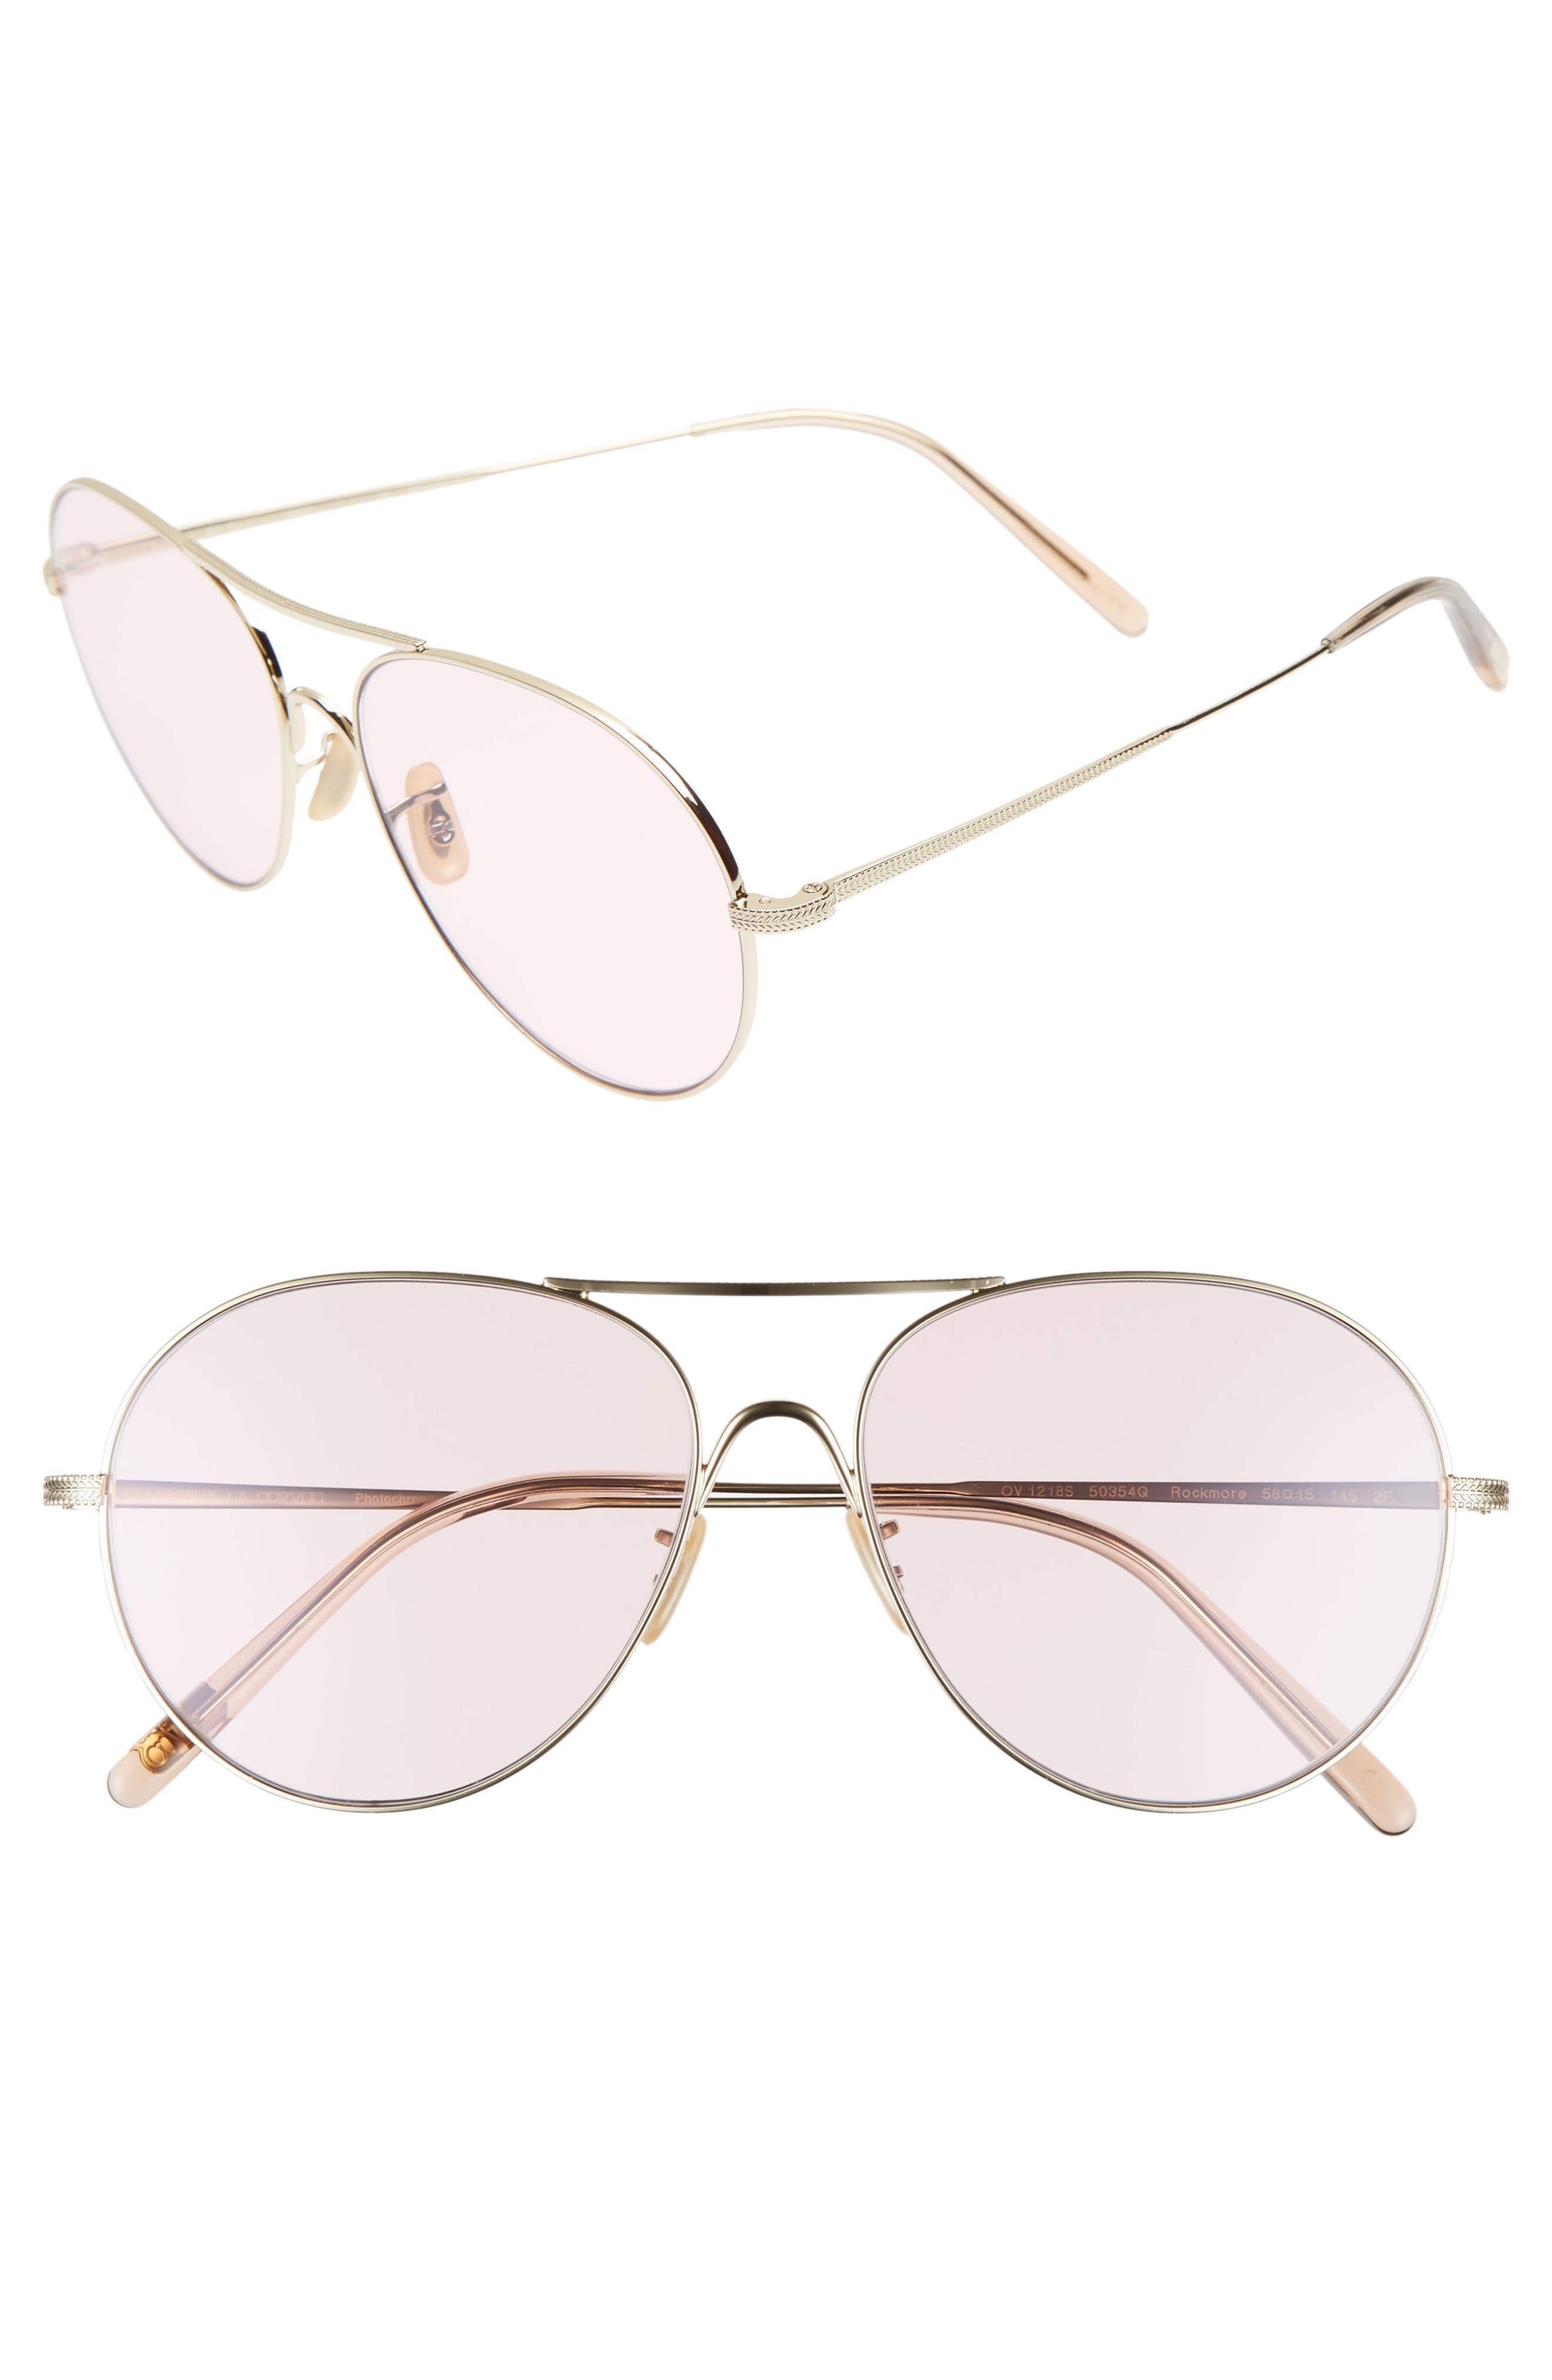 Rockmore 58mm Aviator Sunglasses,                         Main,                         color, PINK